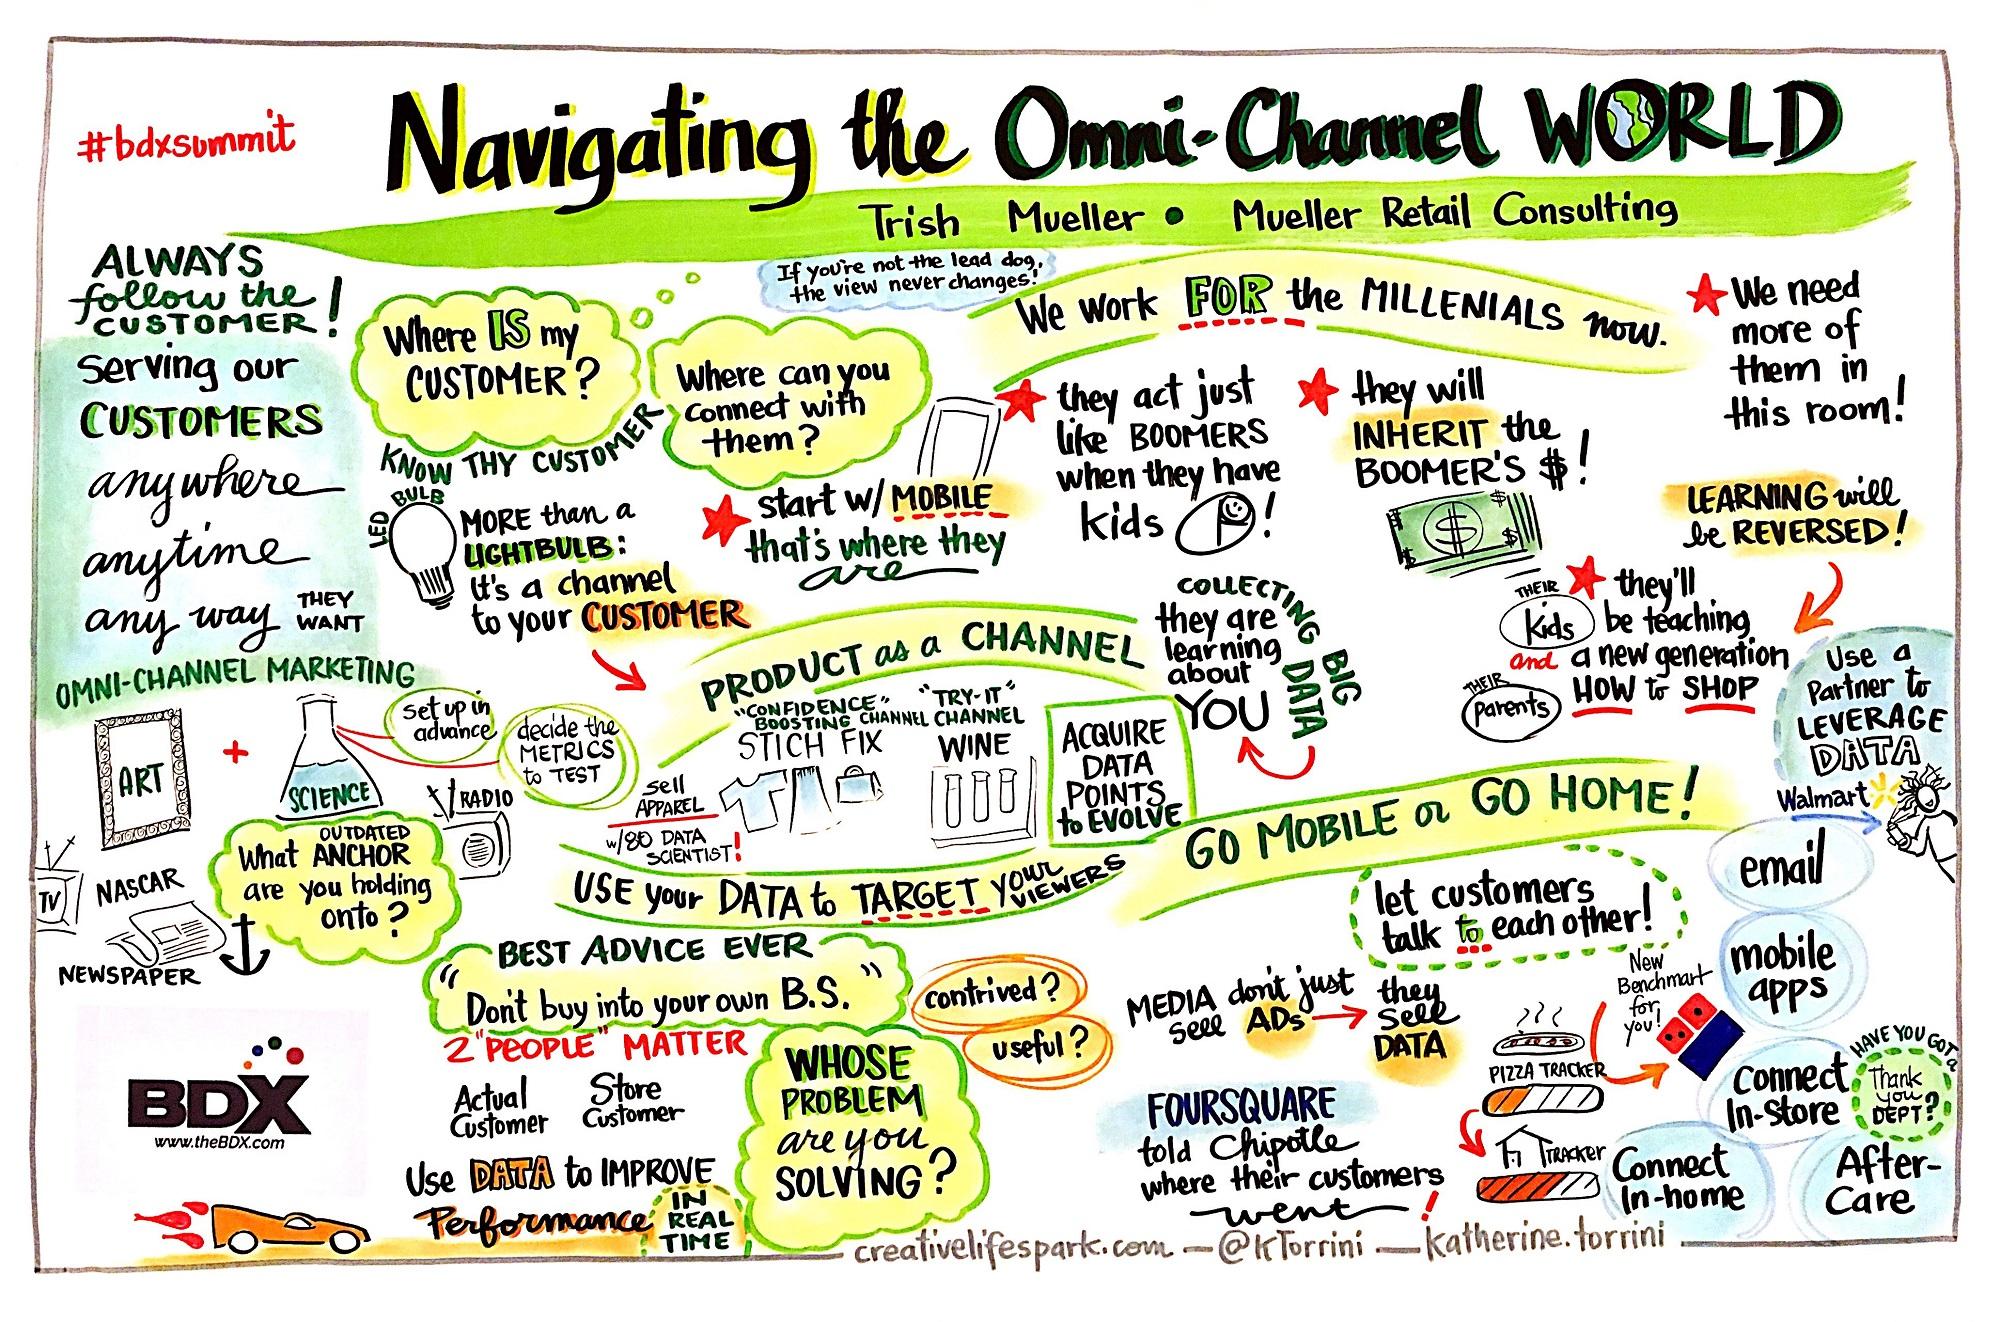 BDX' s Infographic Based On Trish Mueller's Presentation From The 2017 BDX Summit.